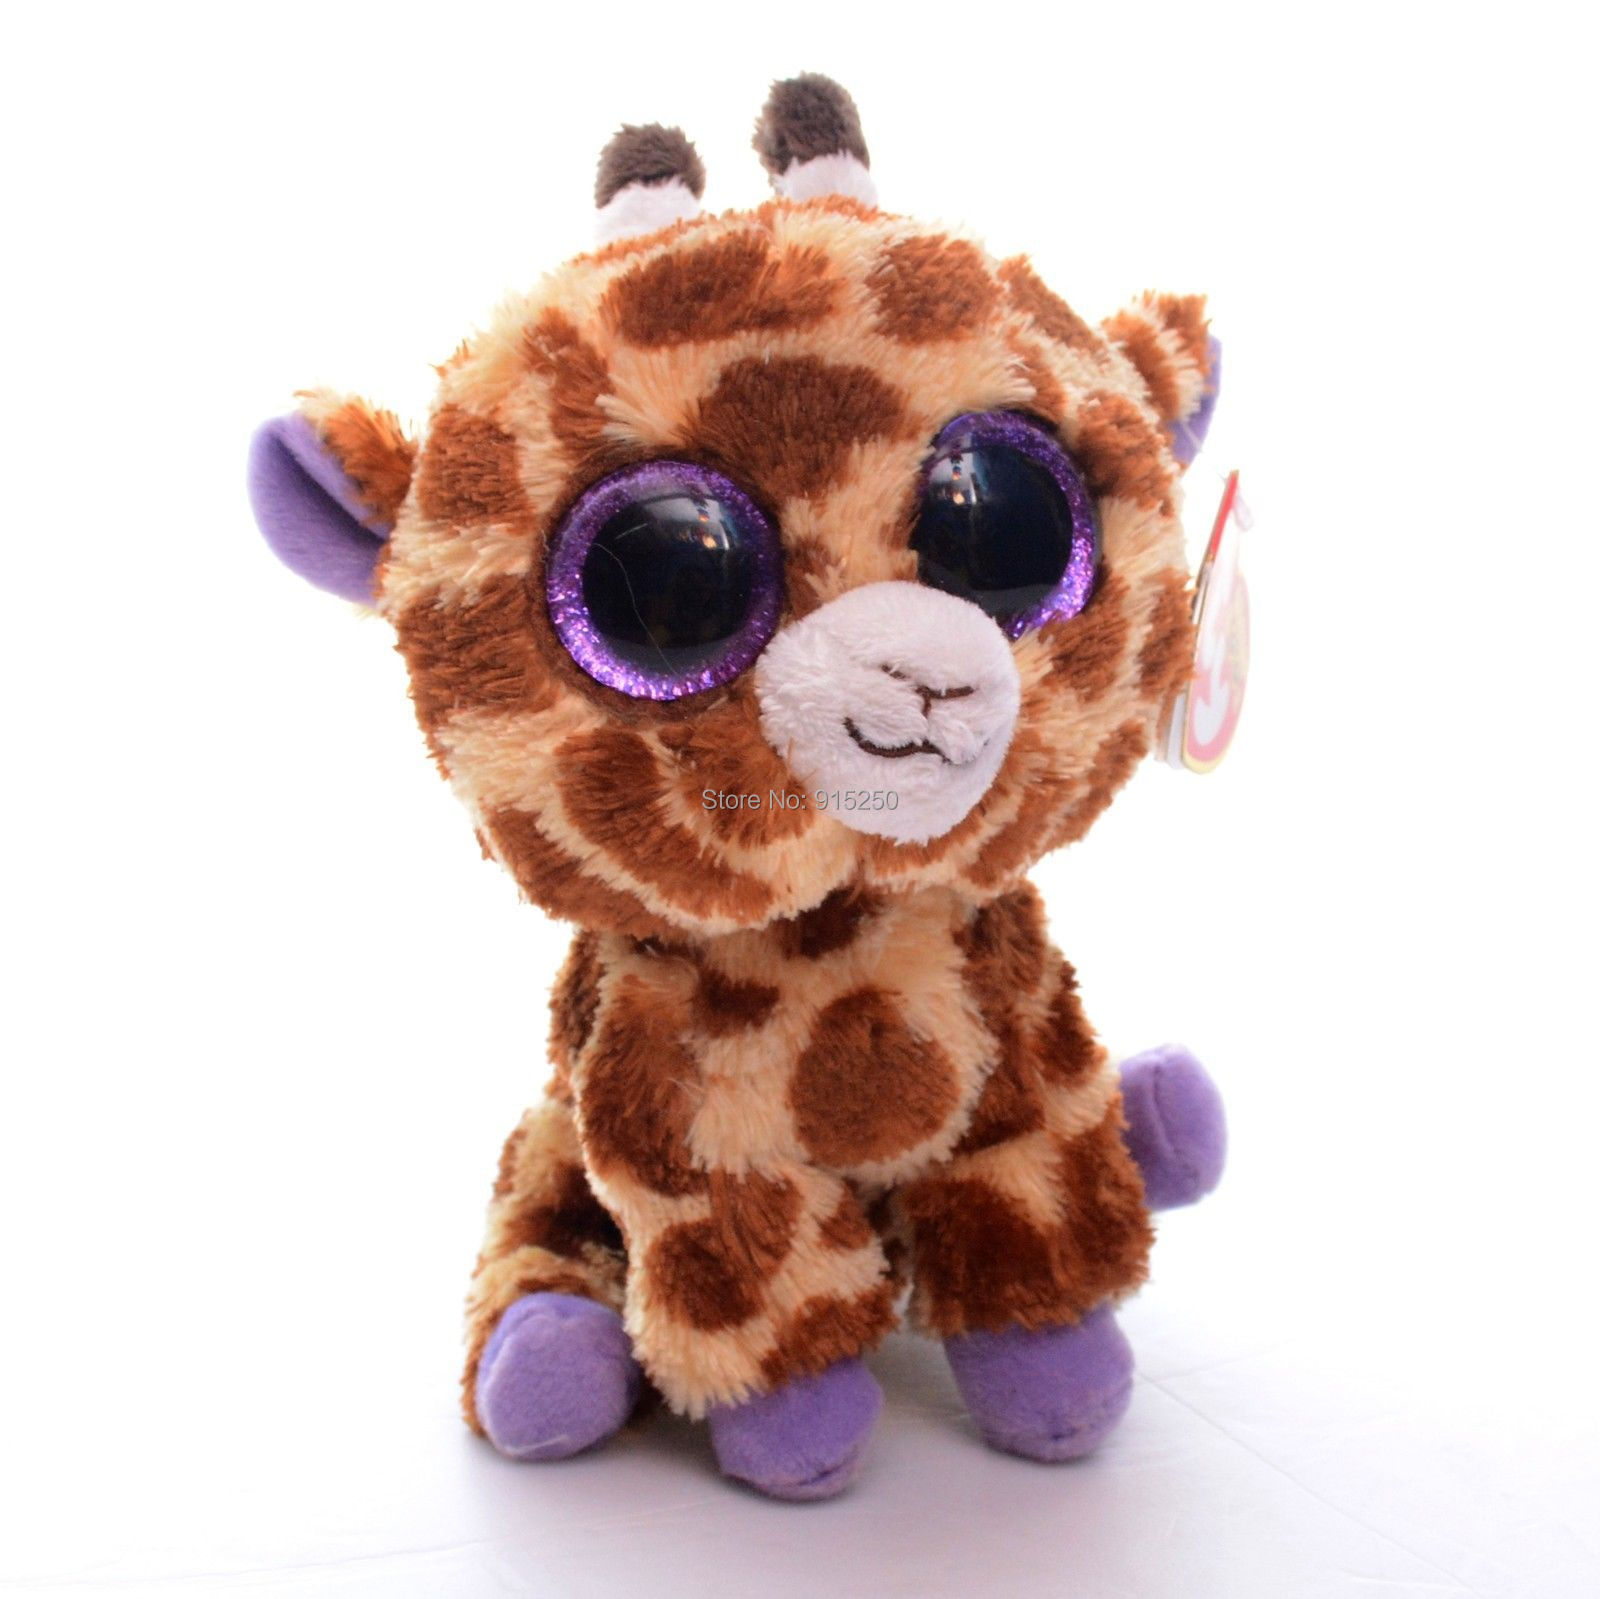 free shipping 5 original ty collection brown safari giraffe plush